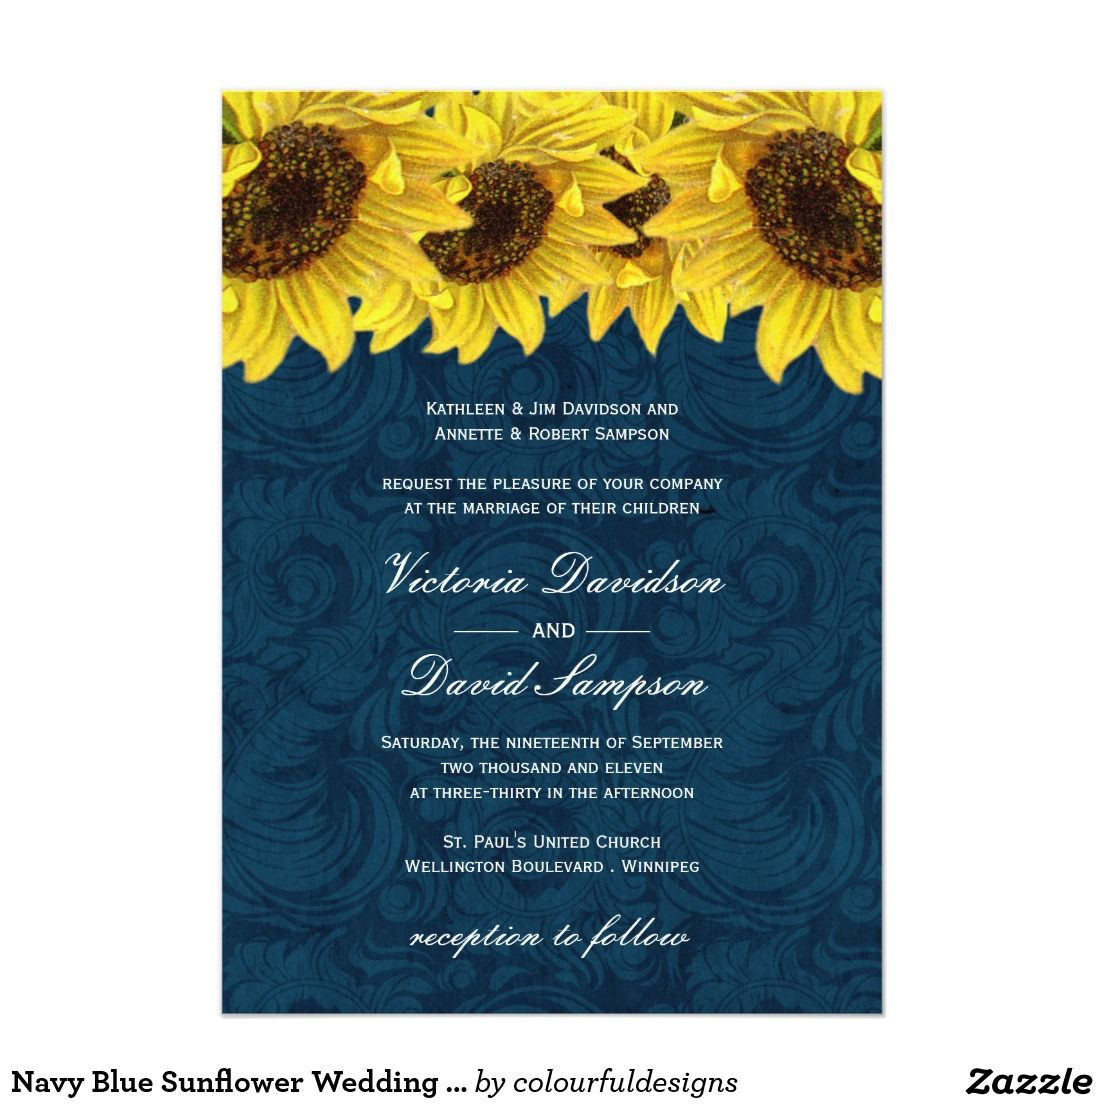 Navy Blue Sunflower Wedding Invitation 5\